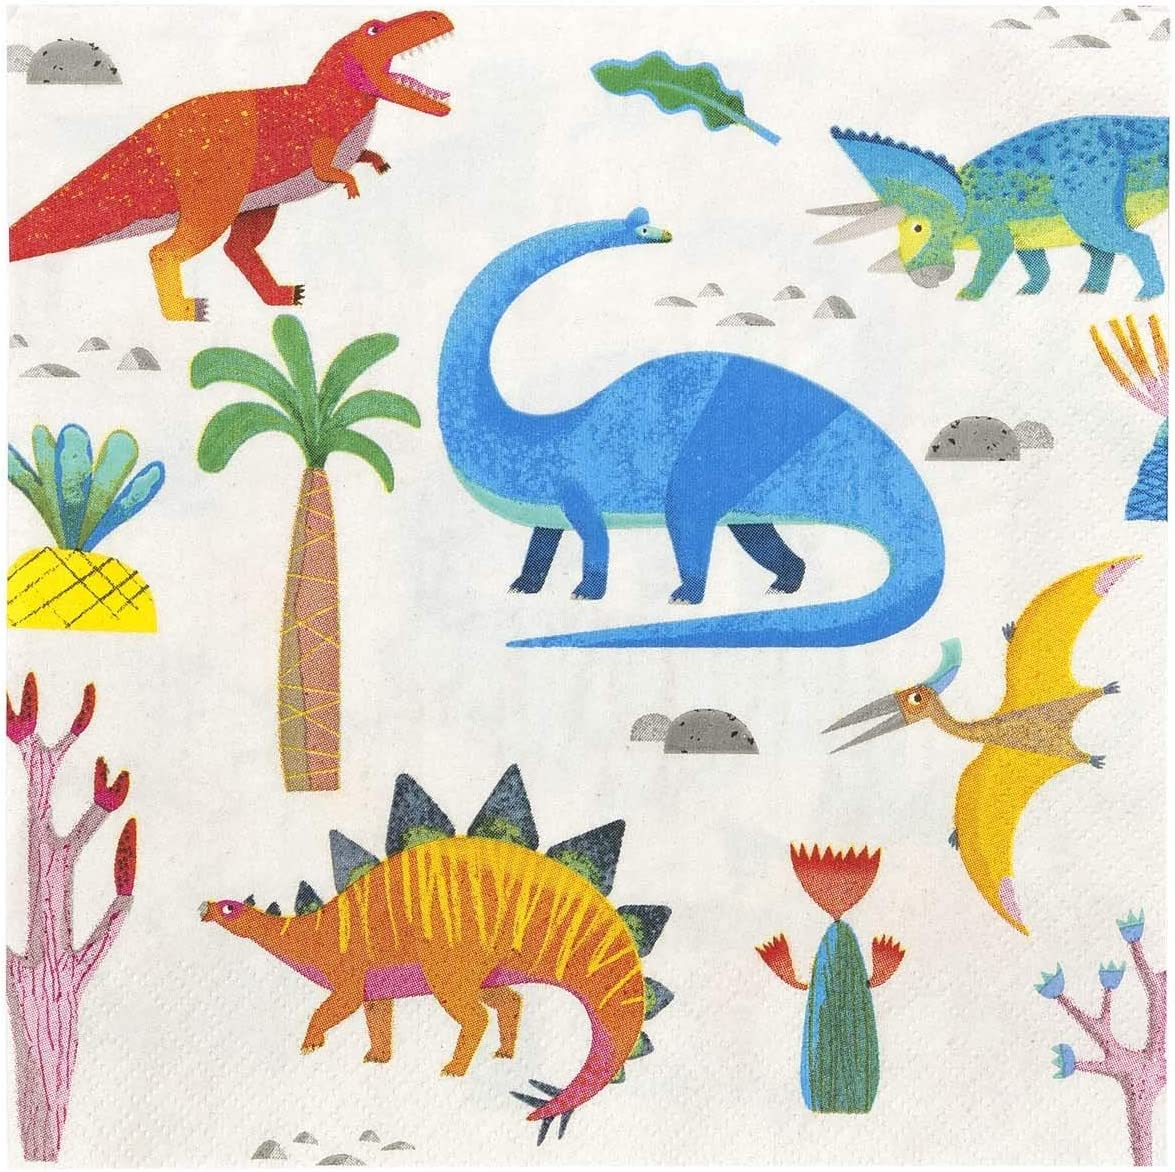 Amazon.com: Dinosaurio suministros de fiesta dinosaurios ...